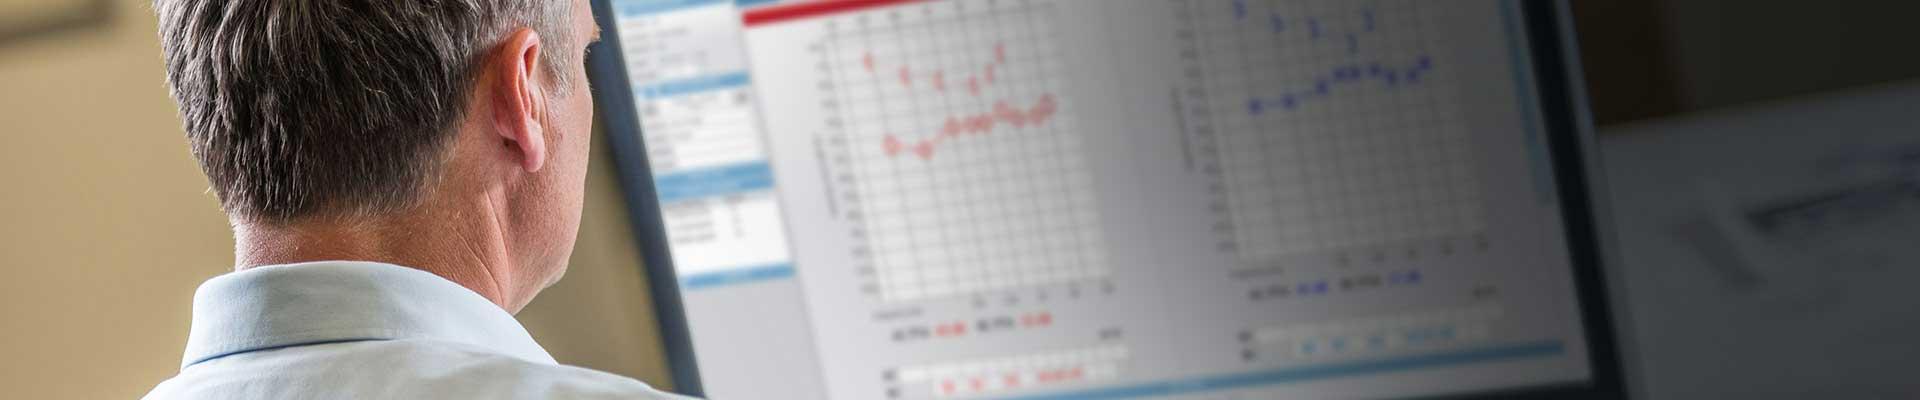 Audiometric Data Management Software